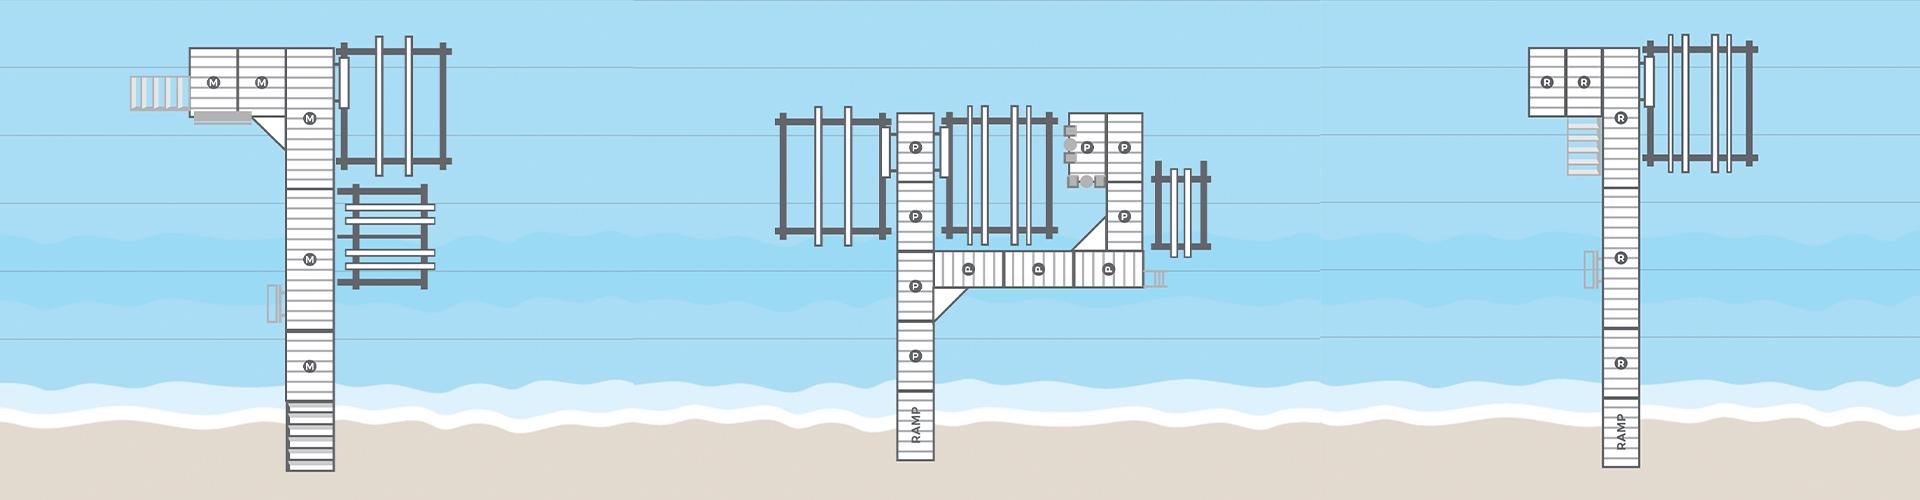 Porta-Dock dock configurator - Dock Layouts